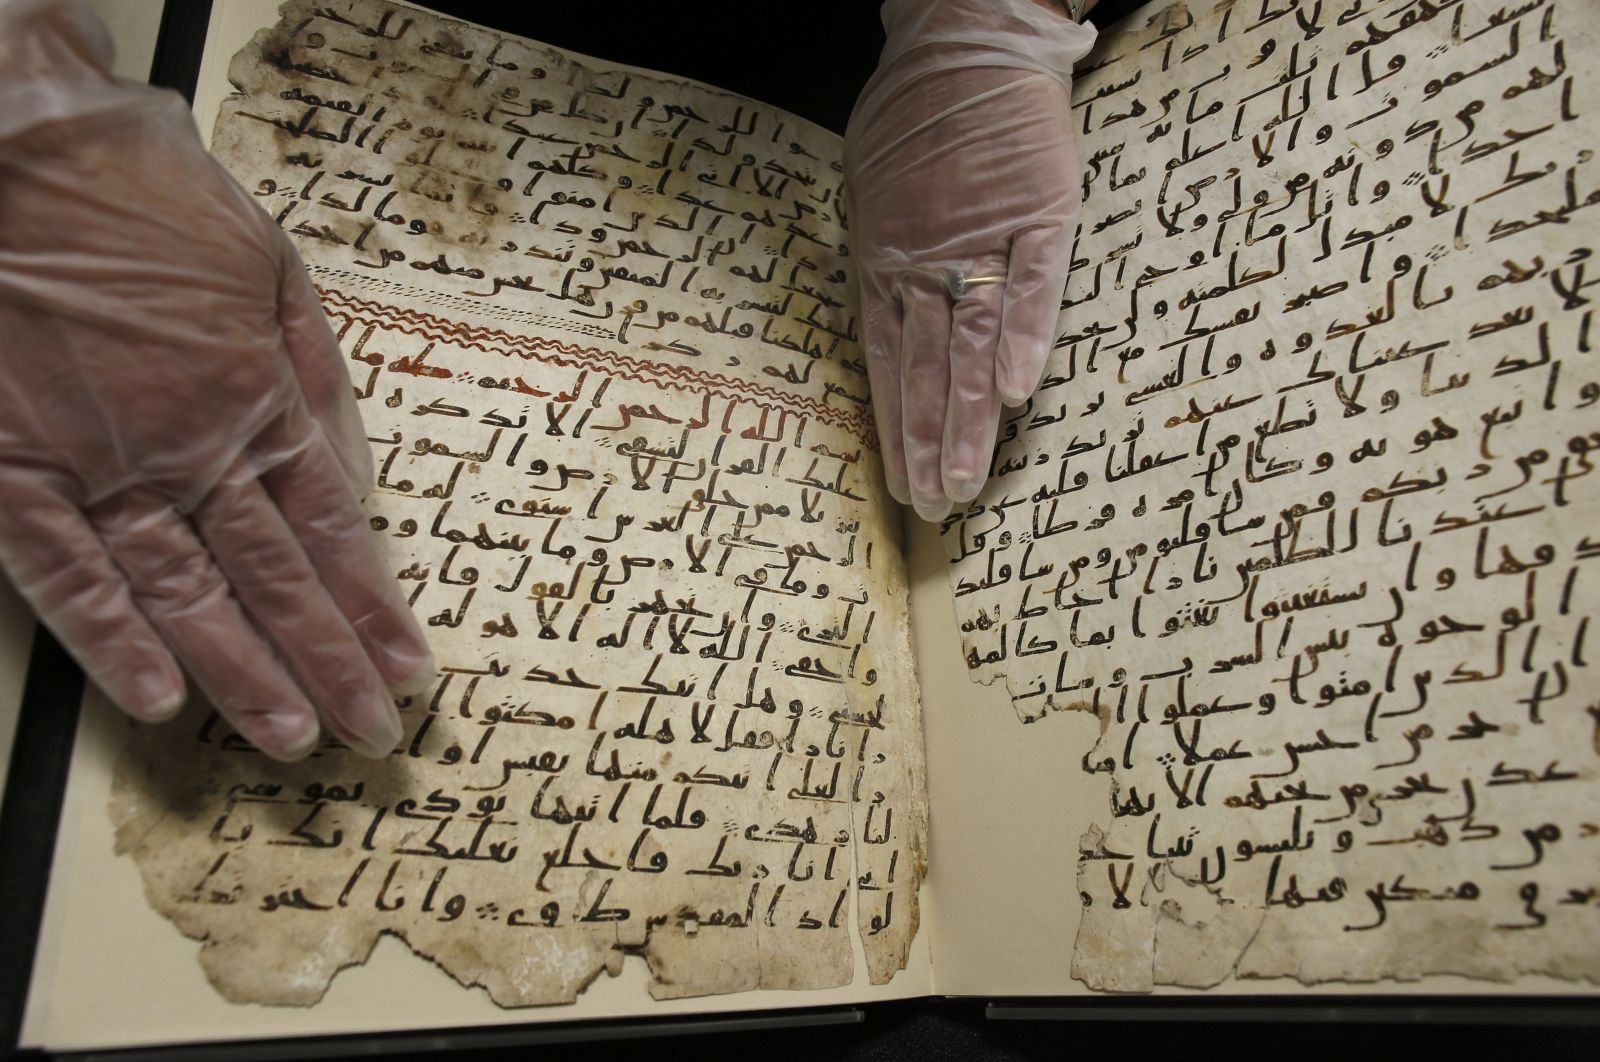 Old Koran found in University of Birmingham